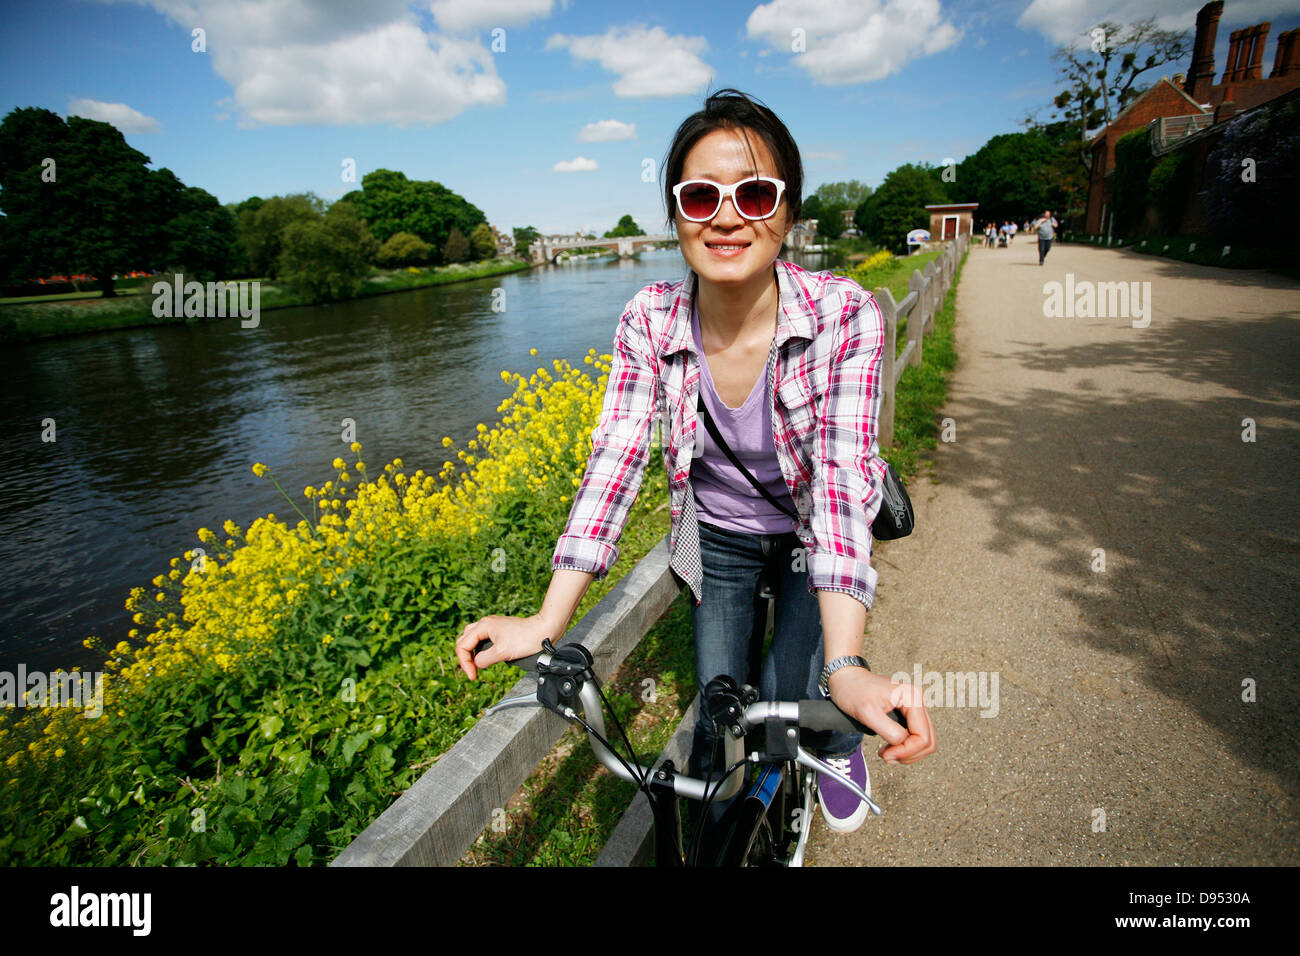 Woman Folding Bike Stock Photos Amp Woman Folding Bike Stock